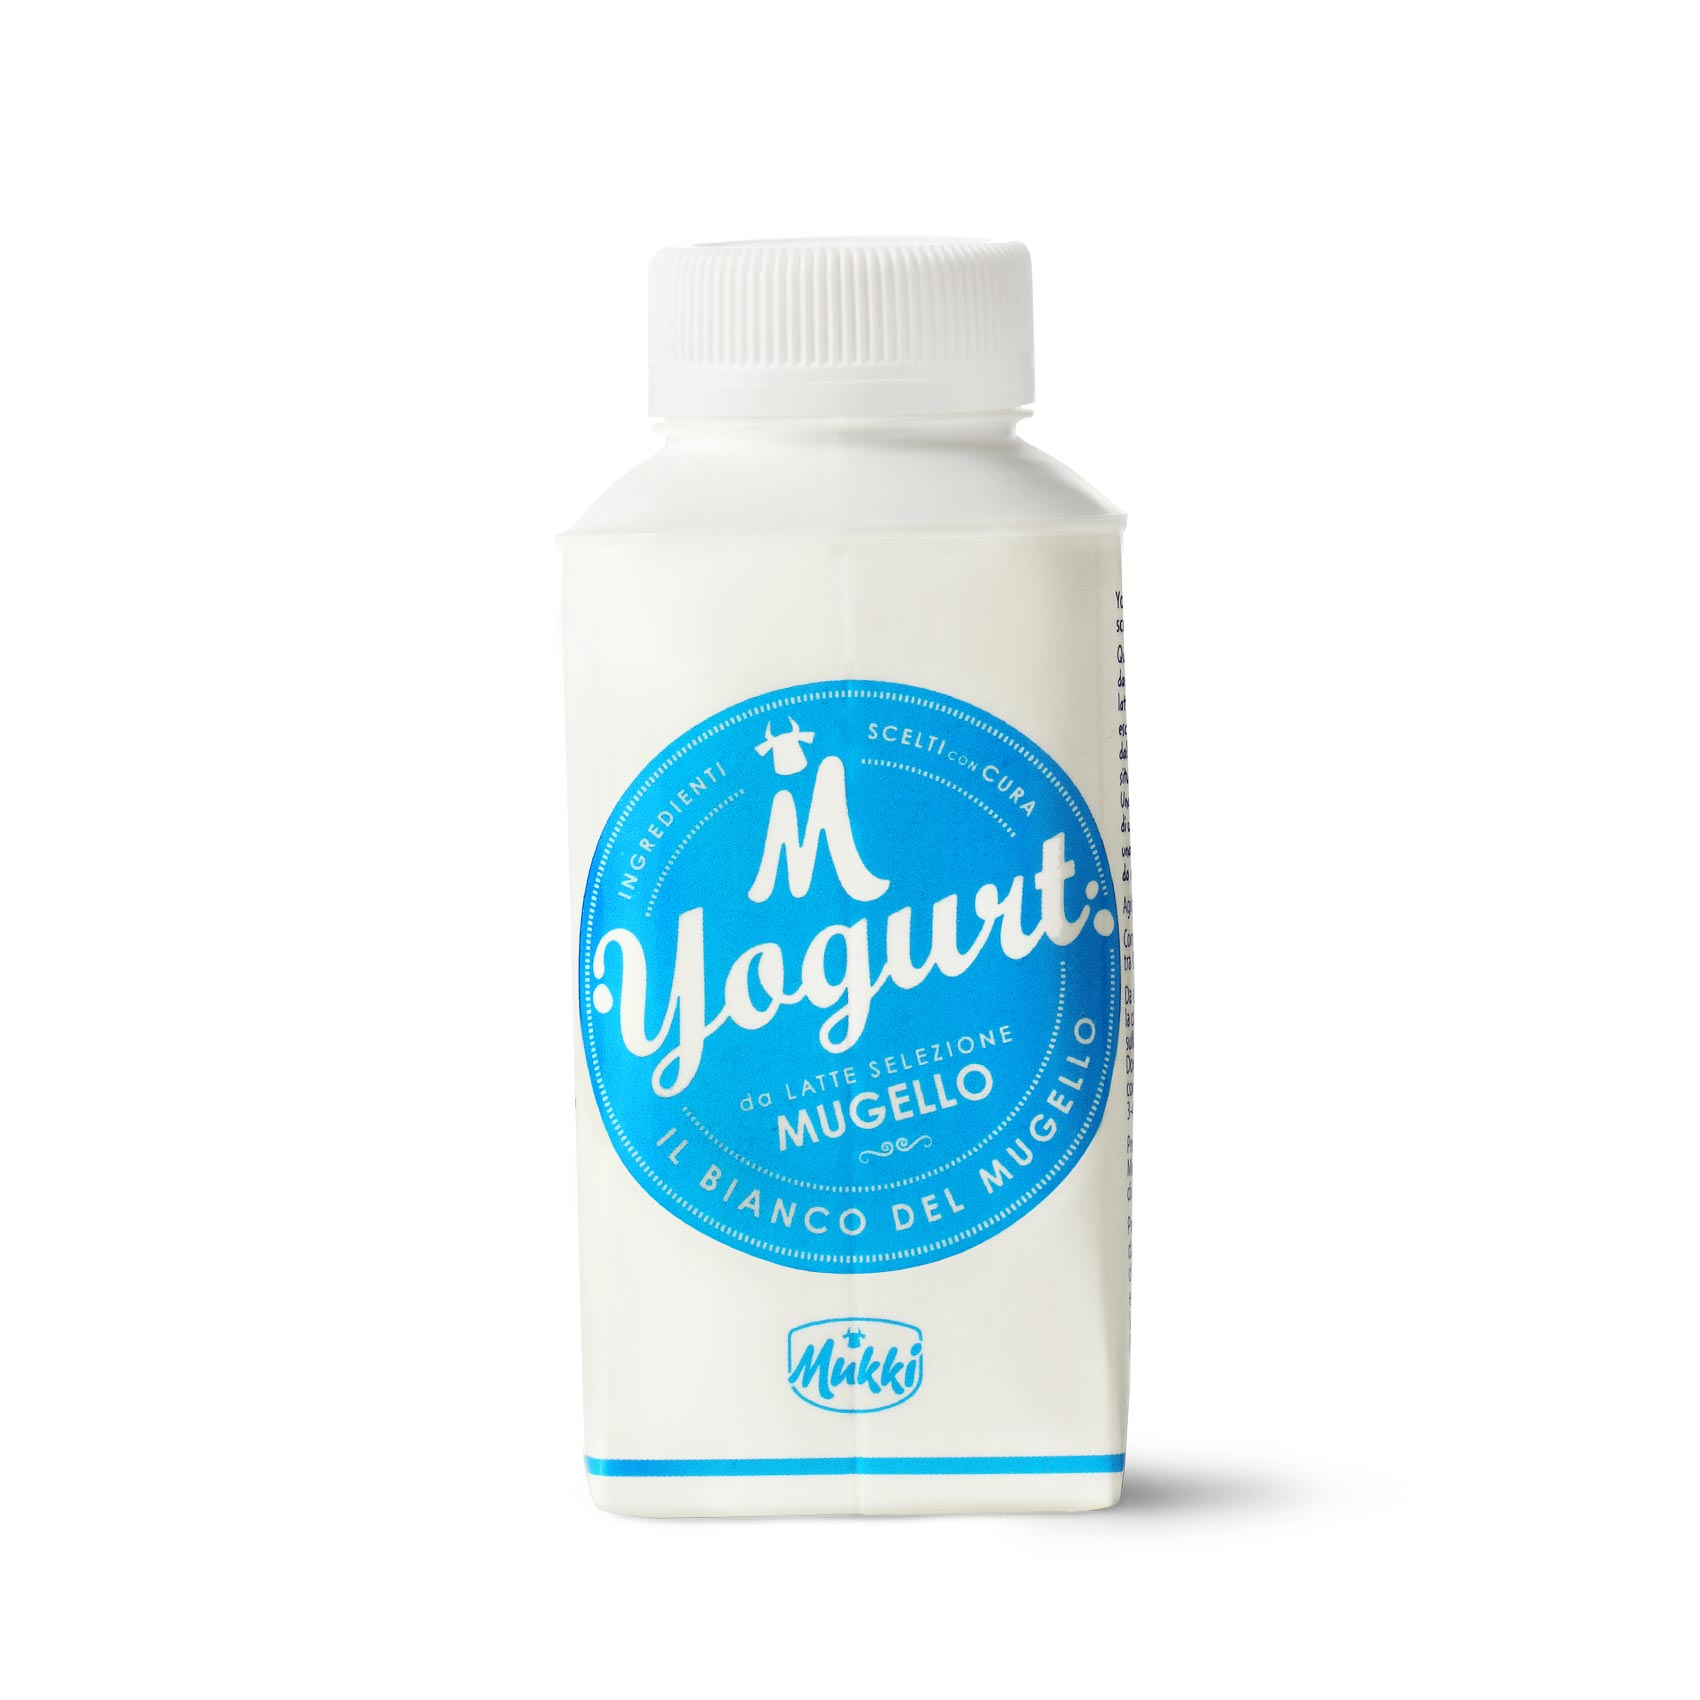 Yogurt da bere Selezione Mugello bianco